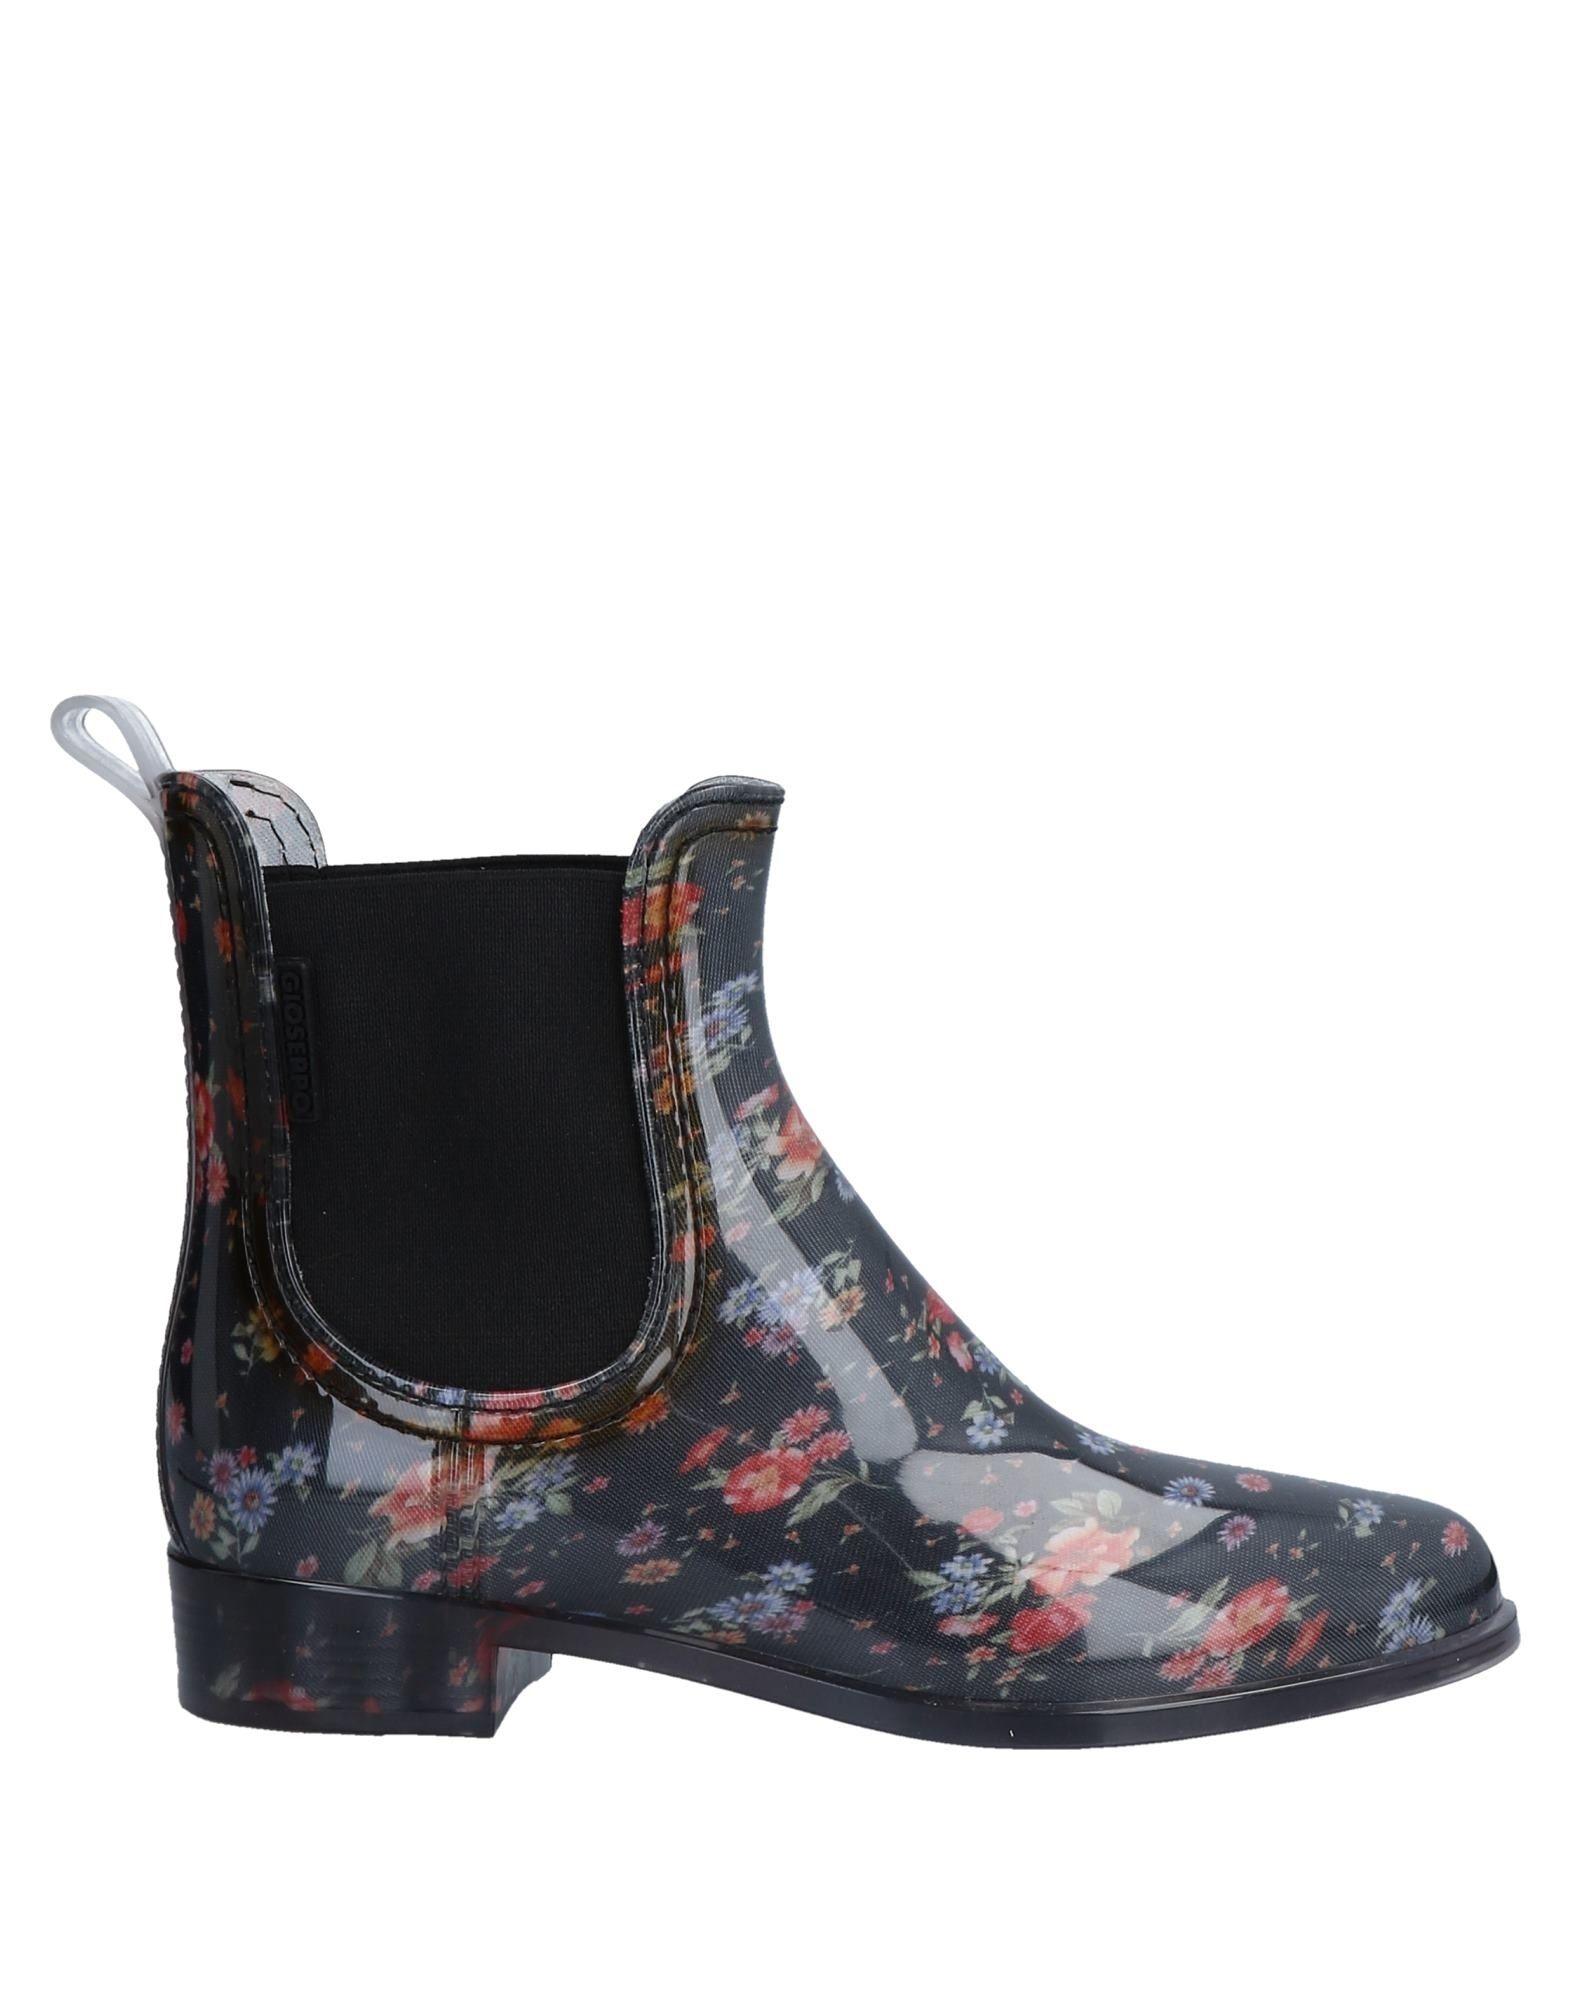 GIOSEPPO Полусапоги и высокие ботинки why not полусапоги и высокие ботинки